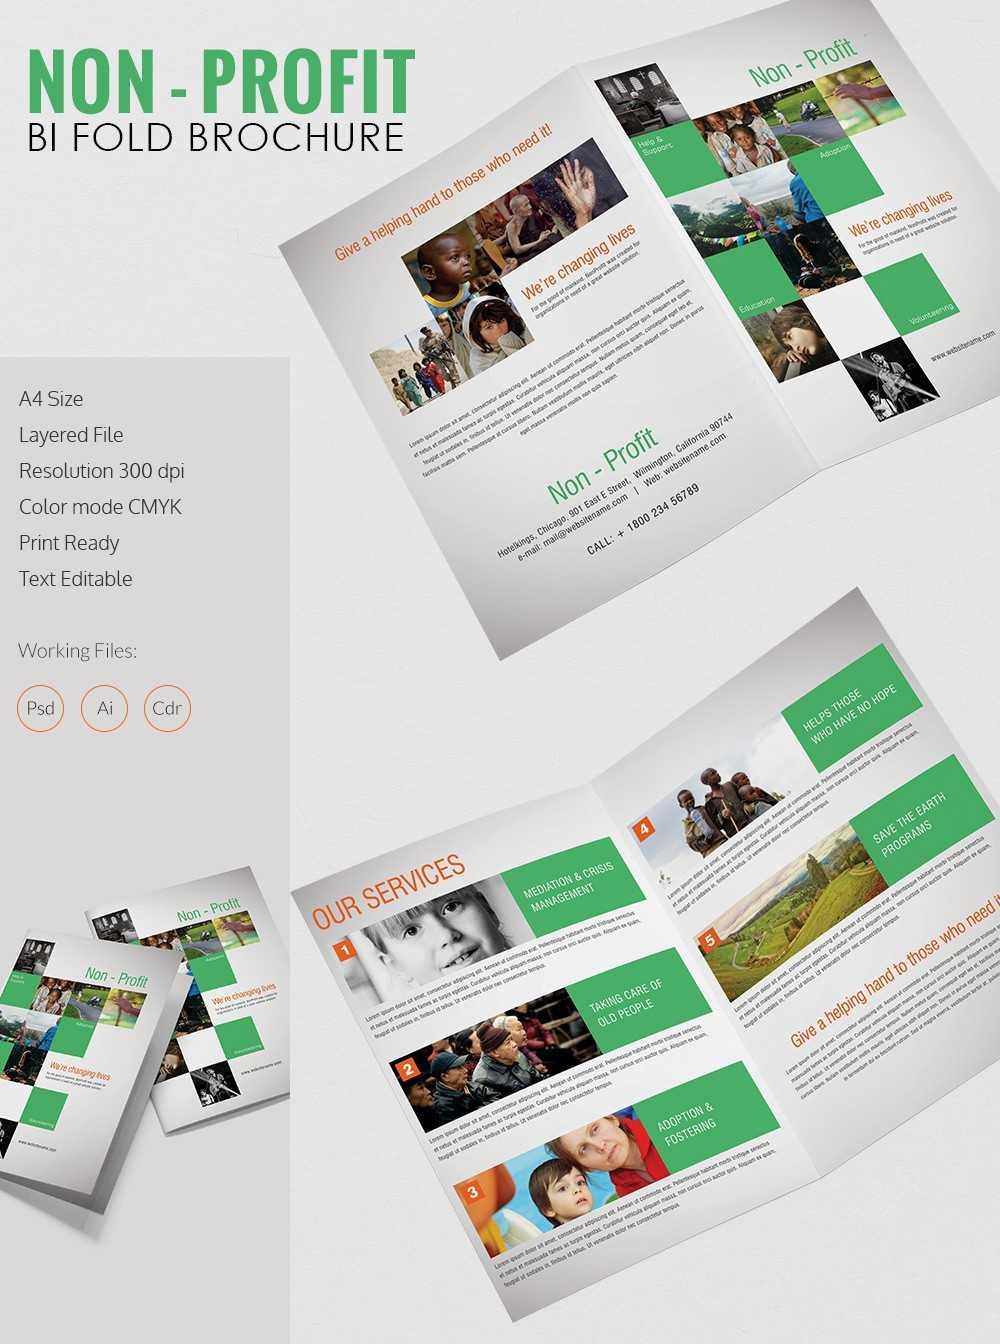 Non Profit Brochure Template Zrom Tk Ngo Templates Within Ngo Brochure Templates